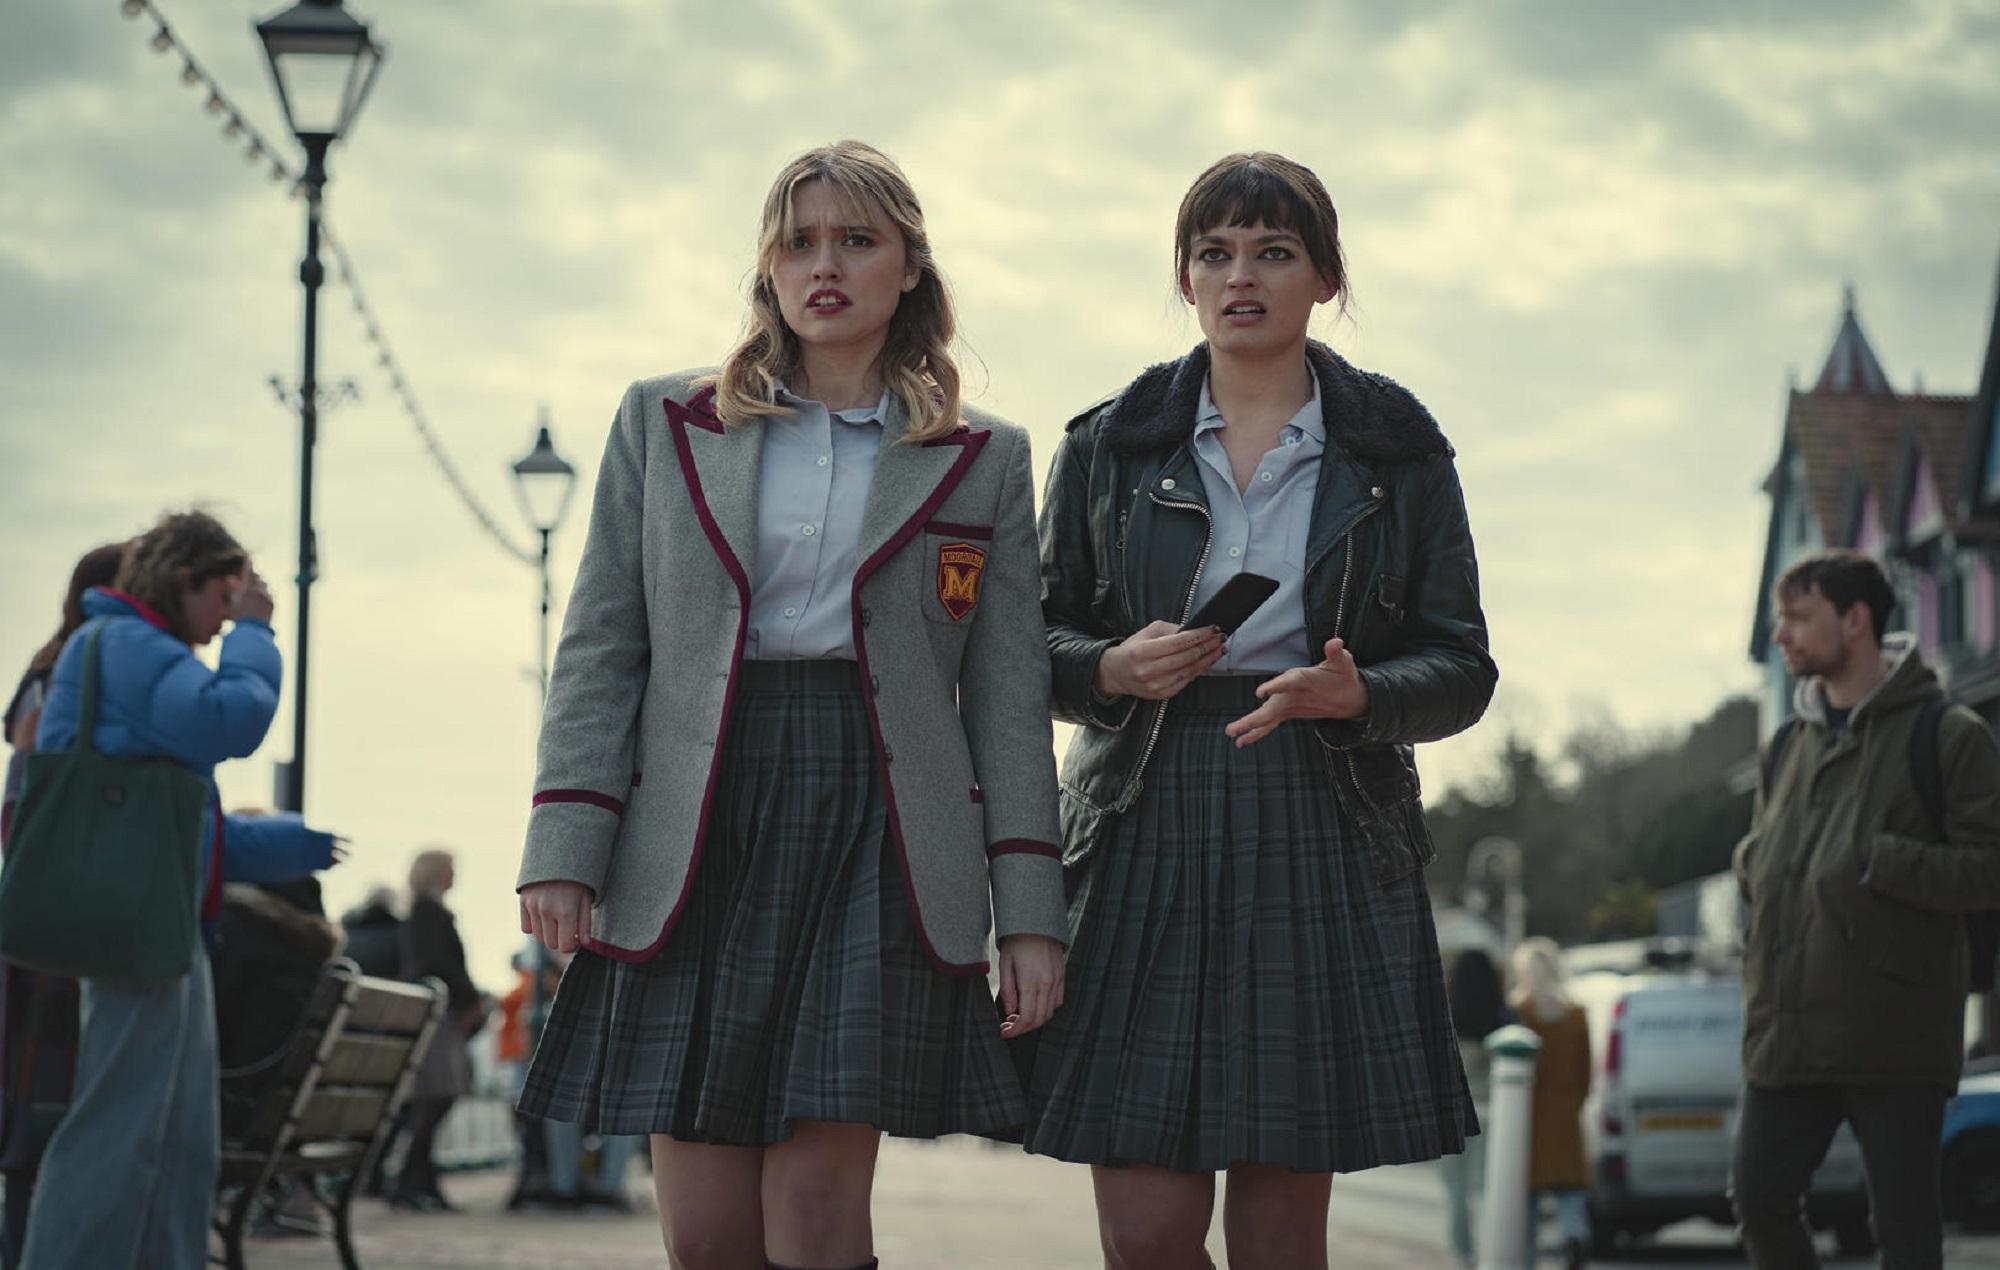 Aimee Lou Wood as Aimee Gibbs, Emma Mackey as Maeve Wiley